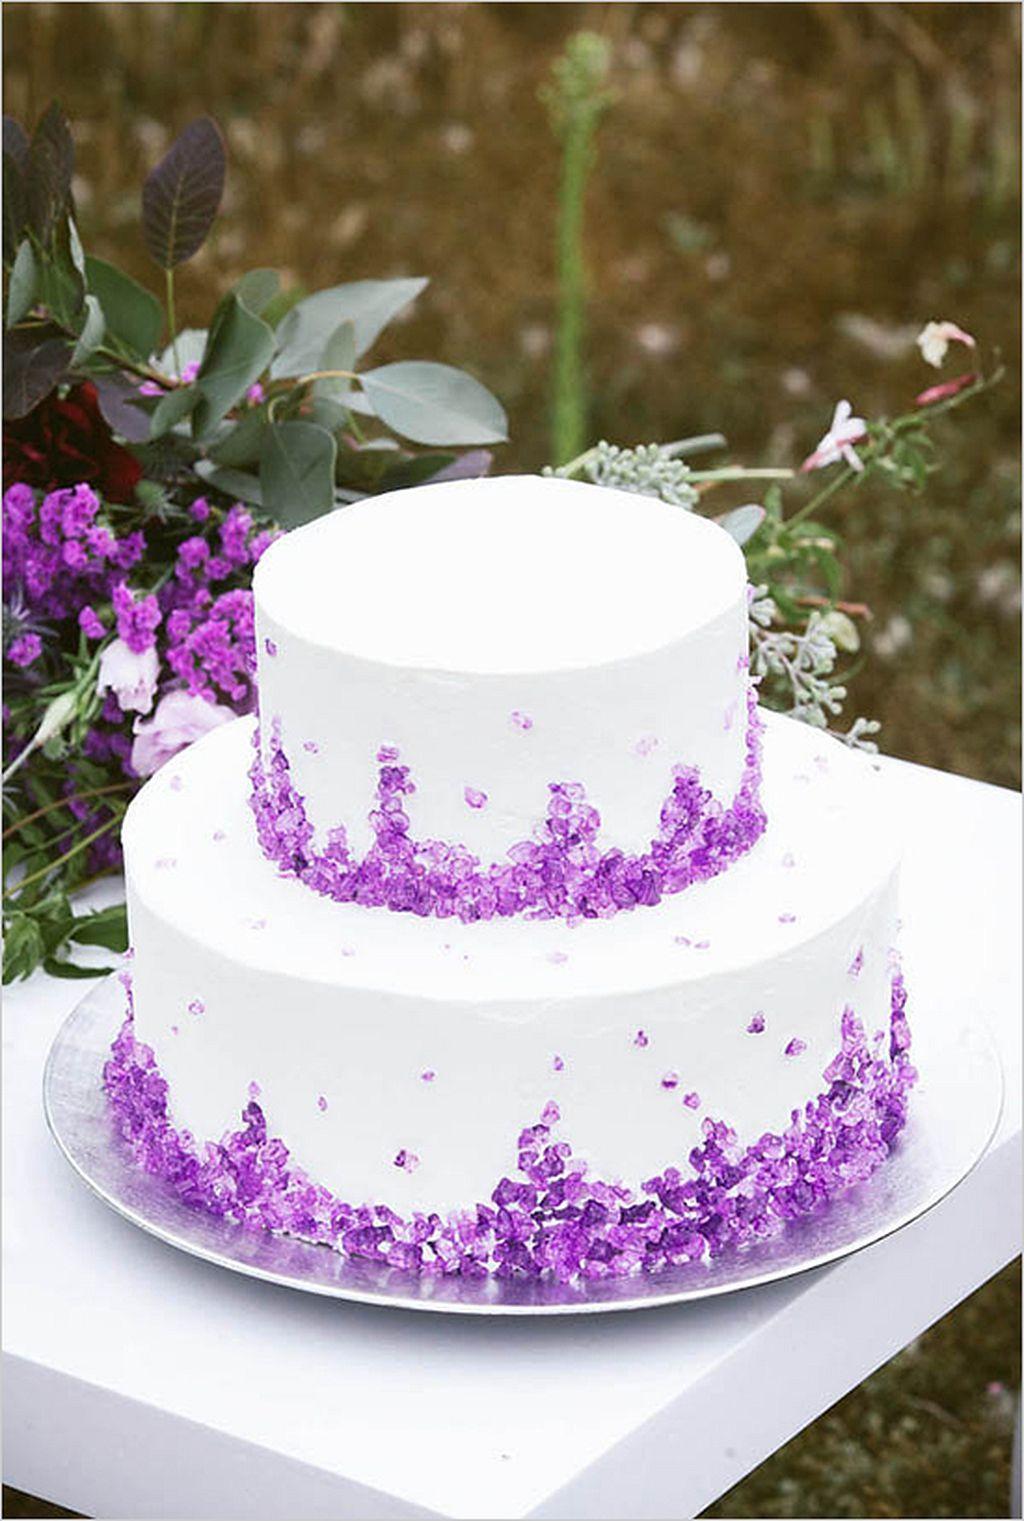 30+ Awesome Crystal Wedding Cake | Crystal wedding, Wedding cake and ...